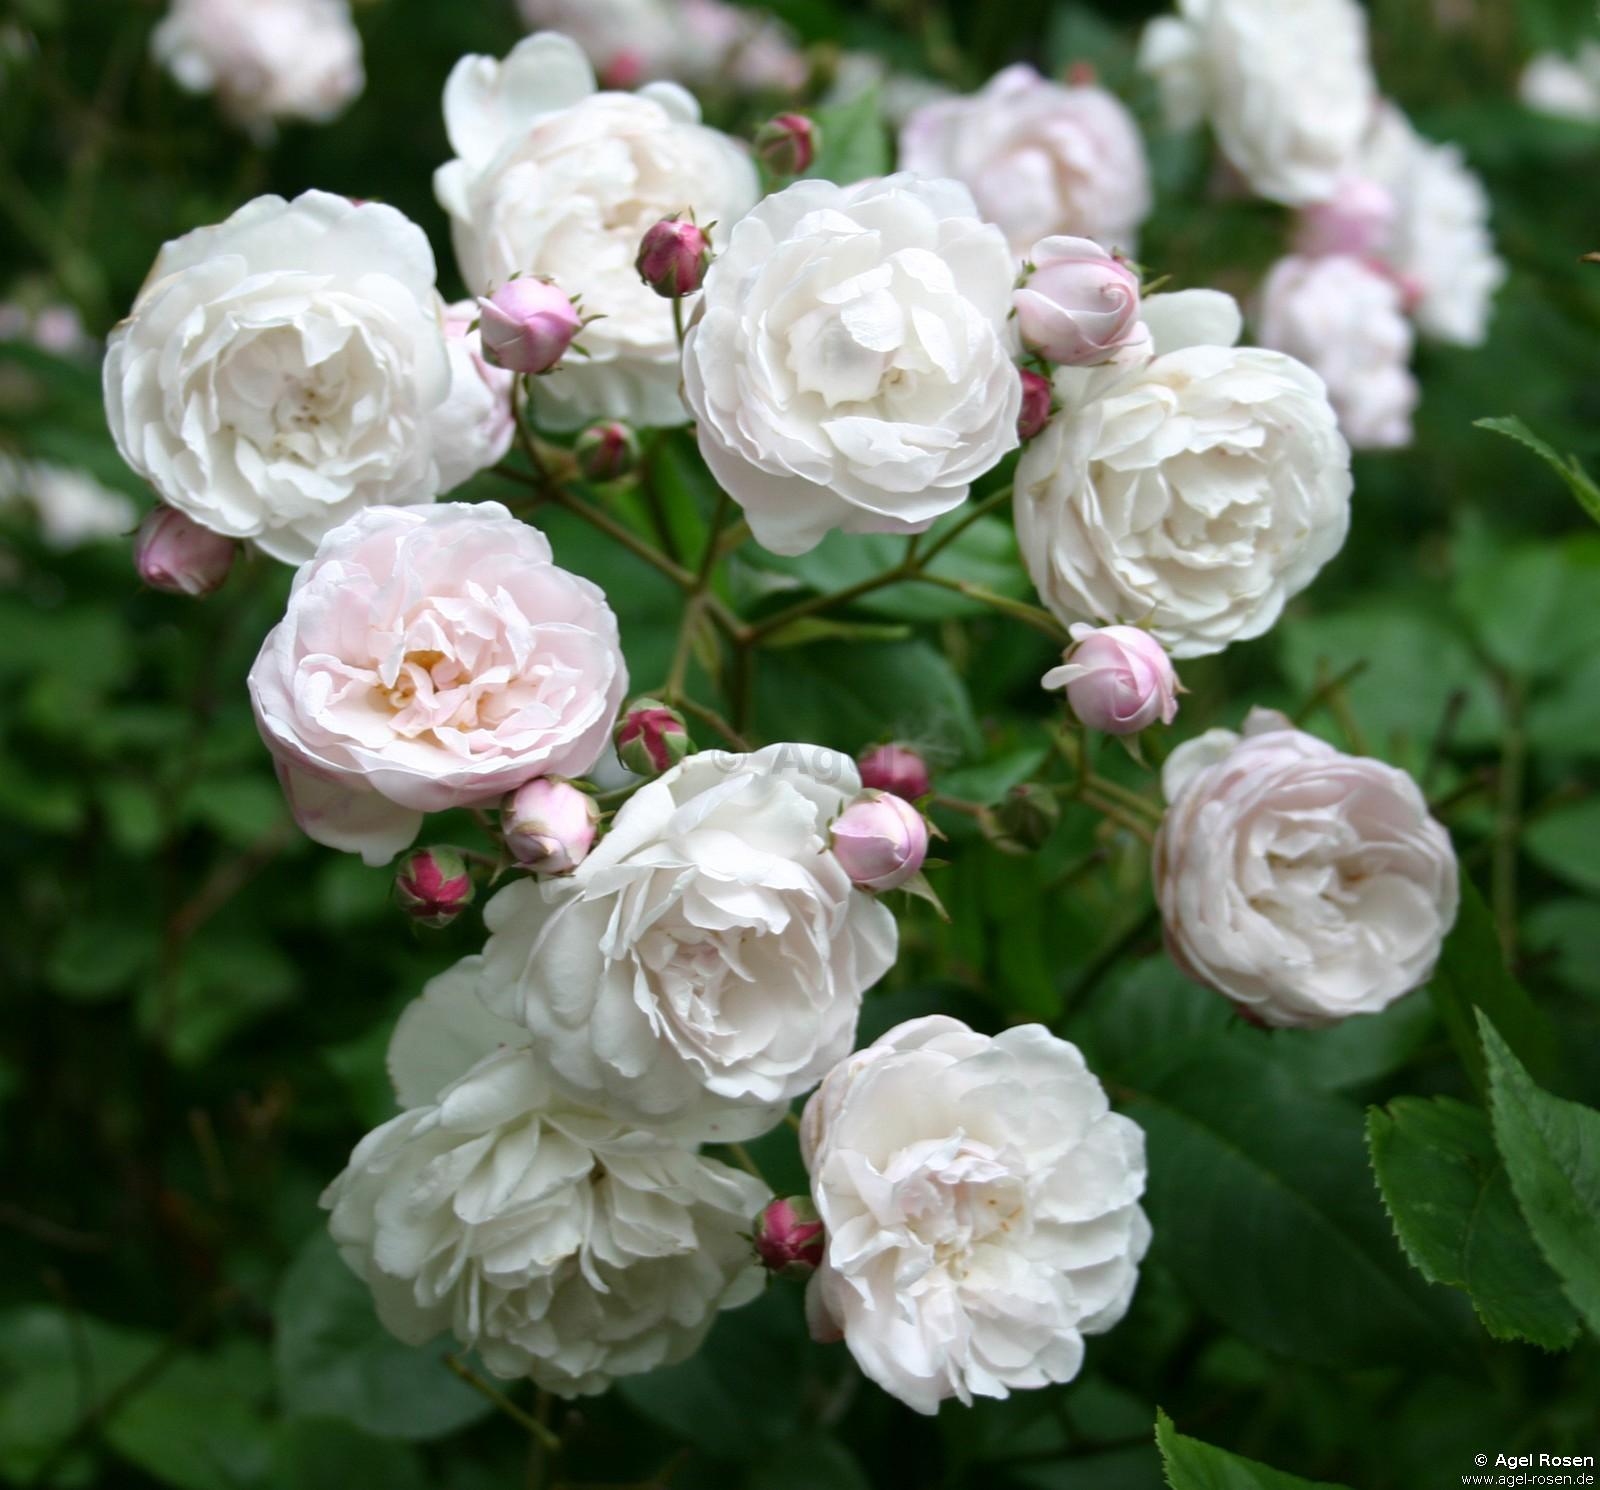 Champneys' Pink Cluster rose Photo: Agel Rosen